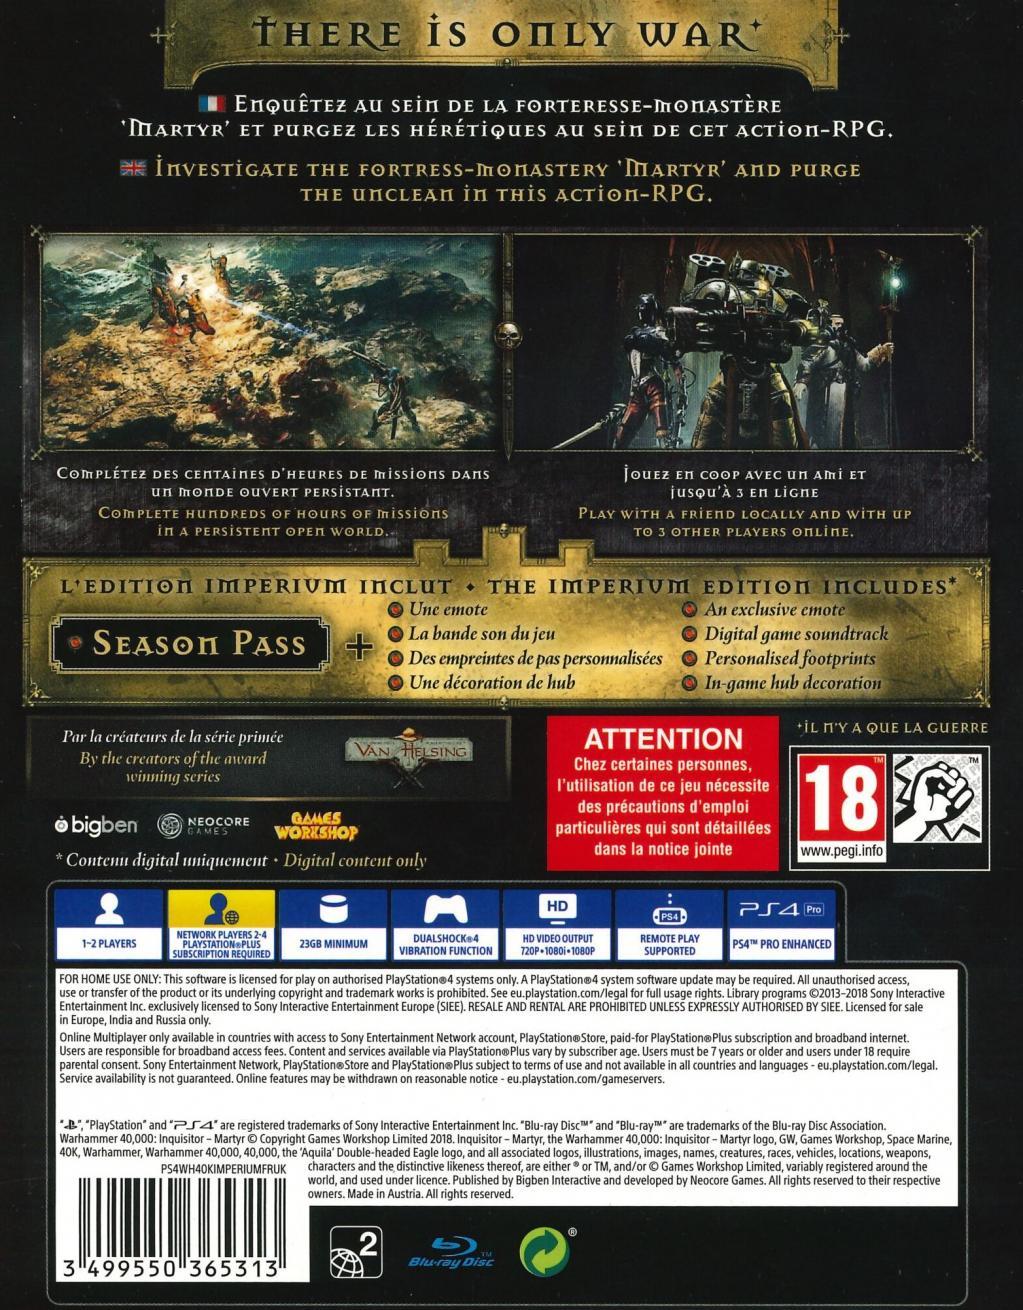 Warhammer 40K Inquisitor Martyr Imperium Edition_2